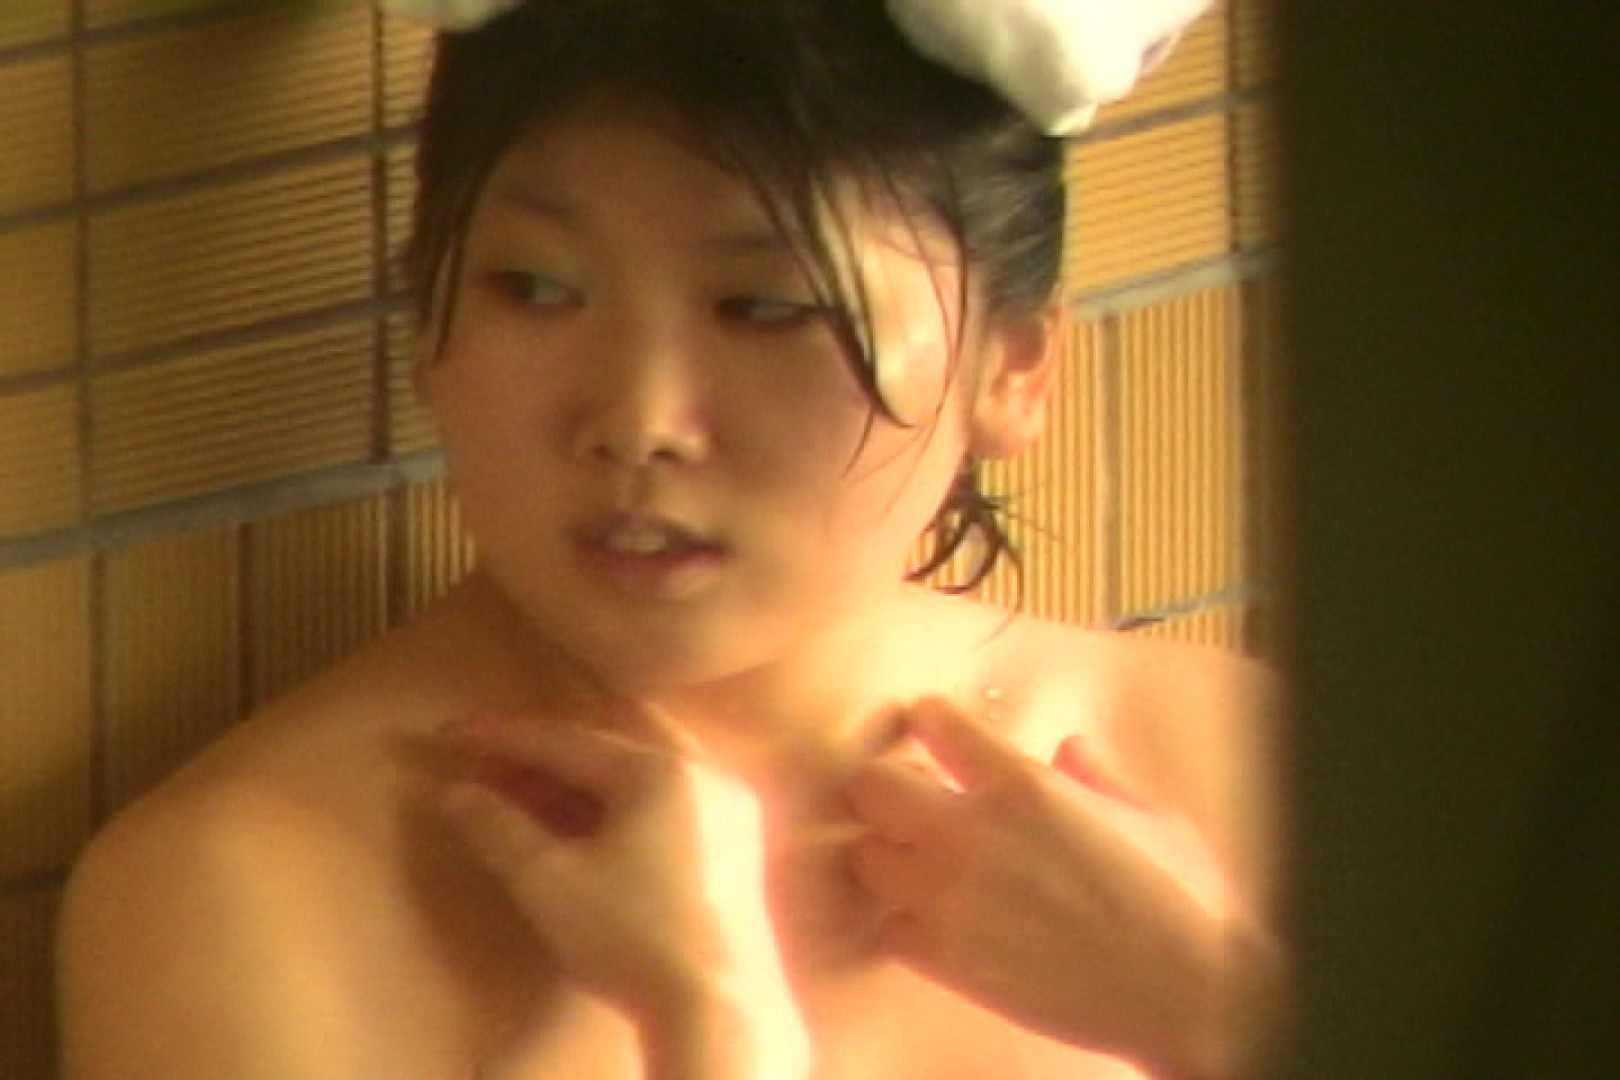 Aquaな露天風呂Vol.704 盗撮師作品  75pic 51